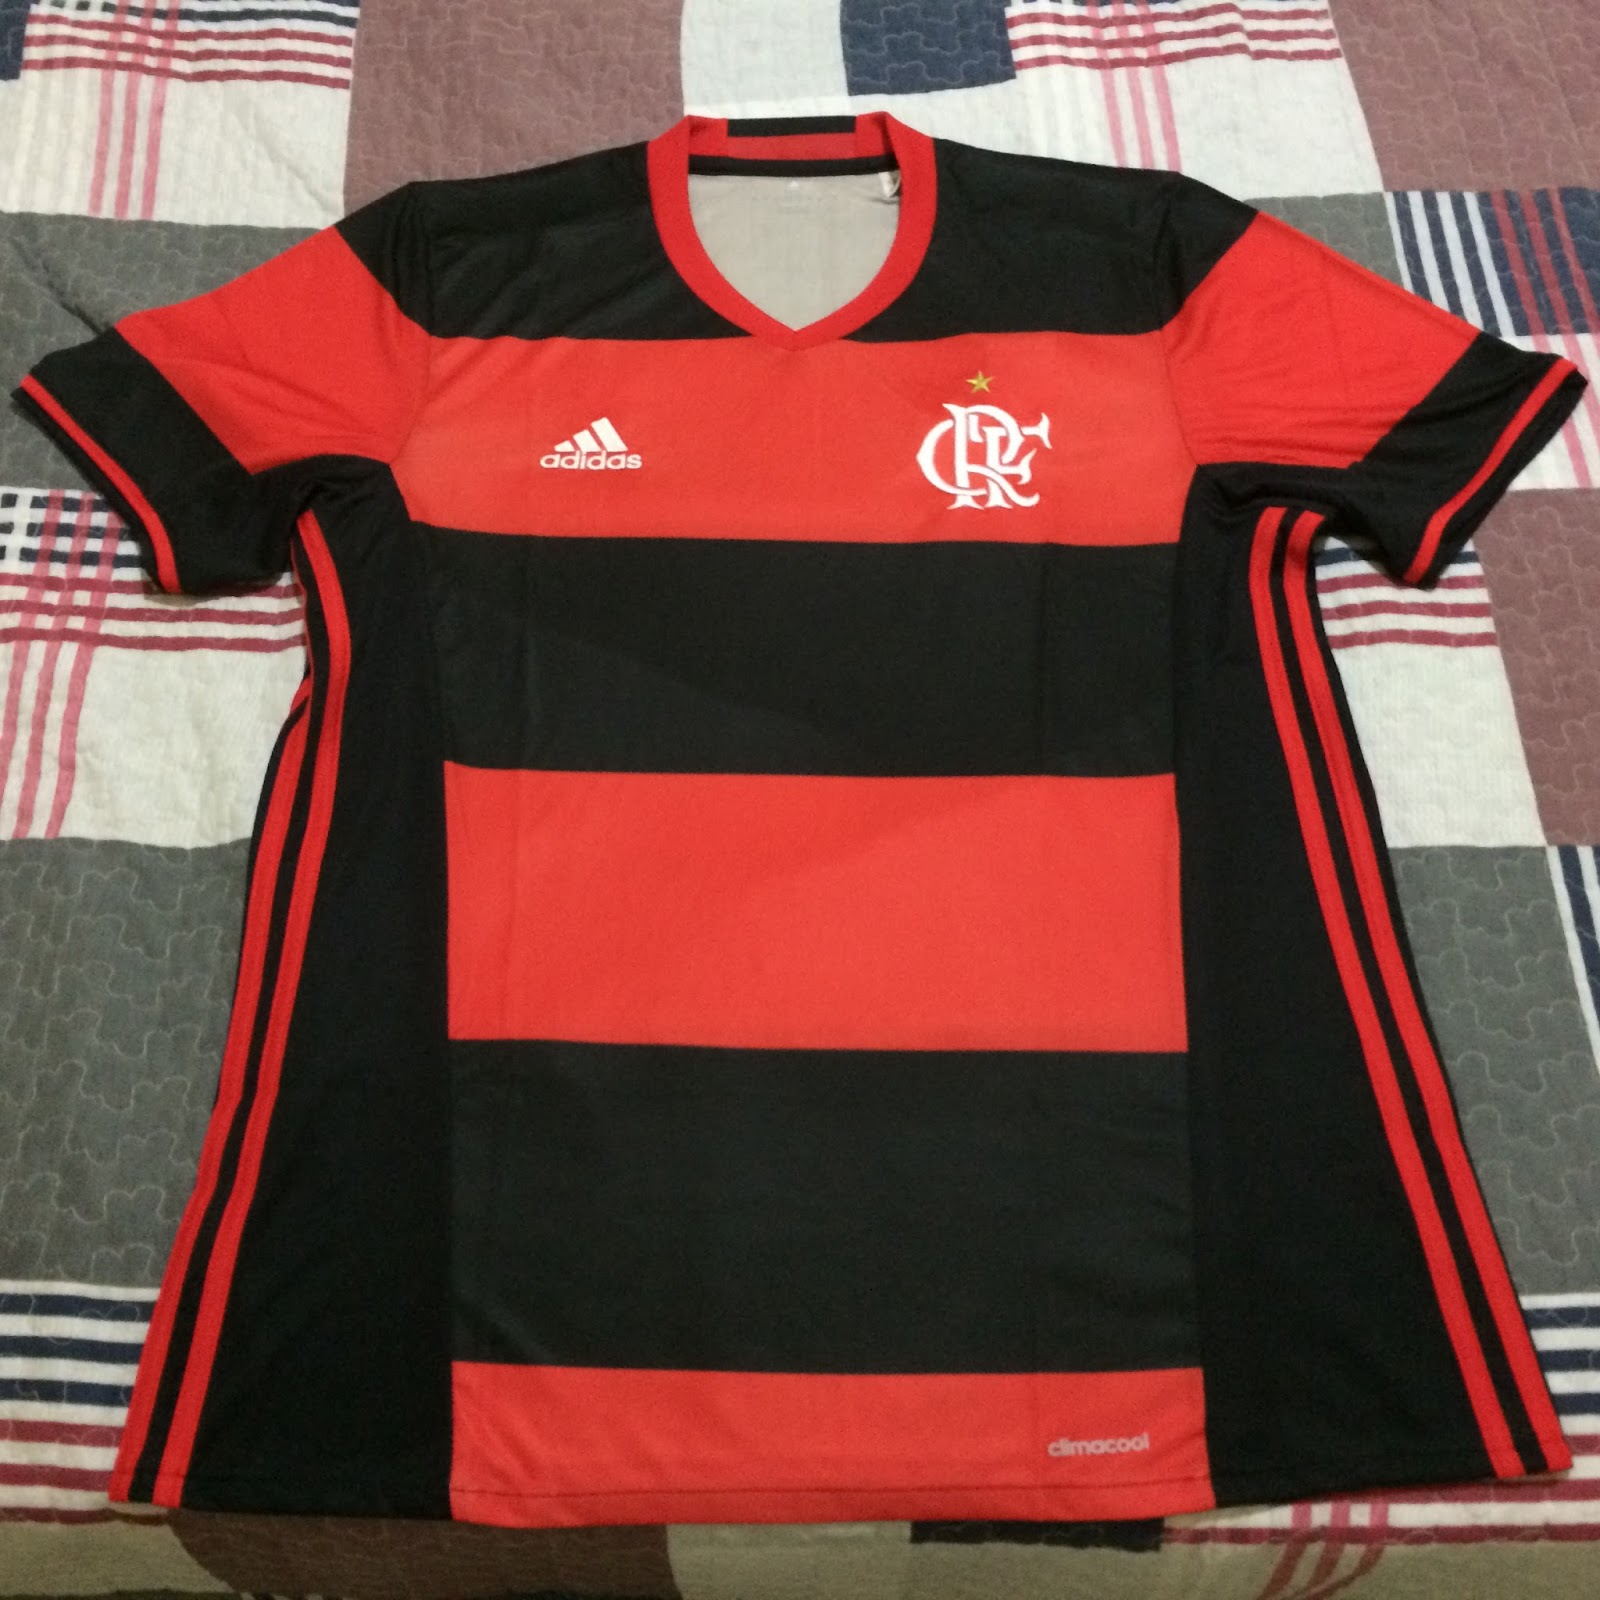 ANÁLISE MANTOTECA - Camisa do Flamengo 2016 b8aa433d6c262